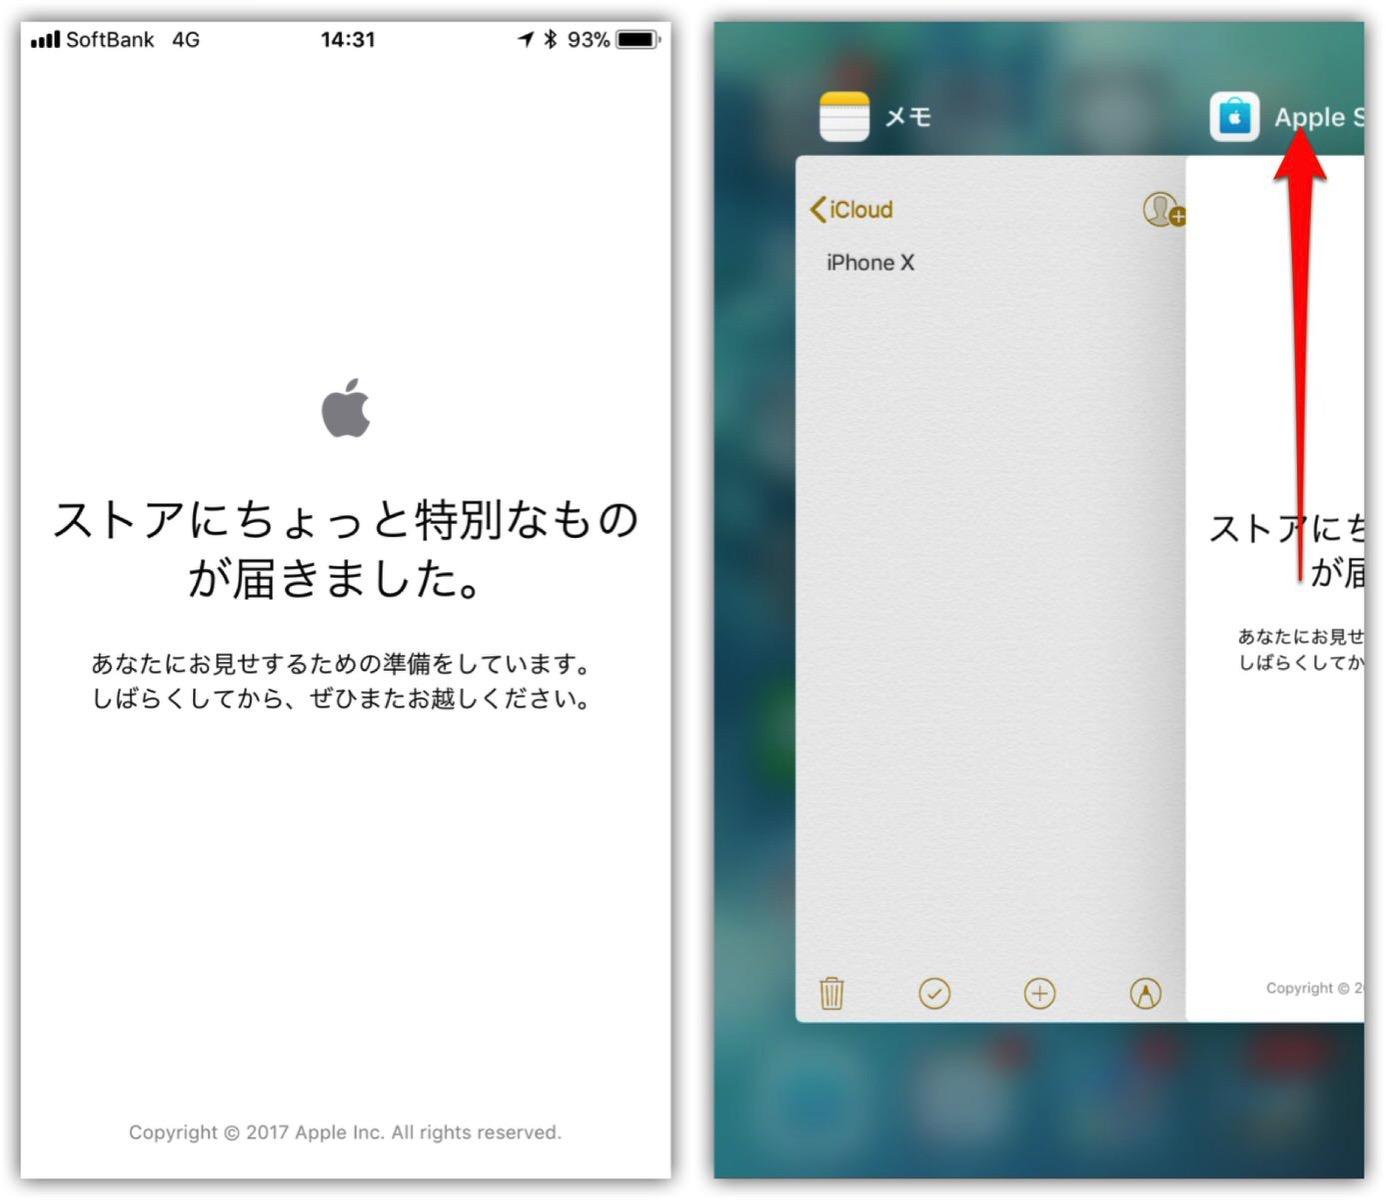 iPhone X Get-1